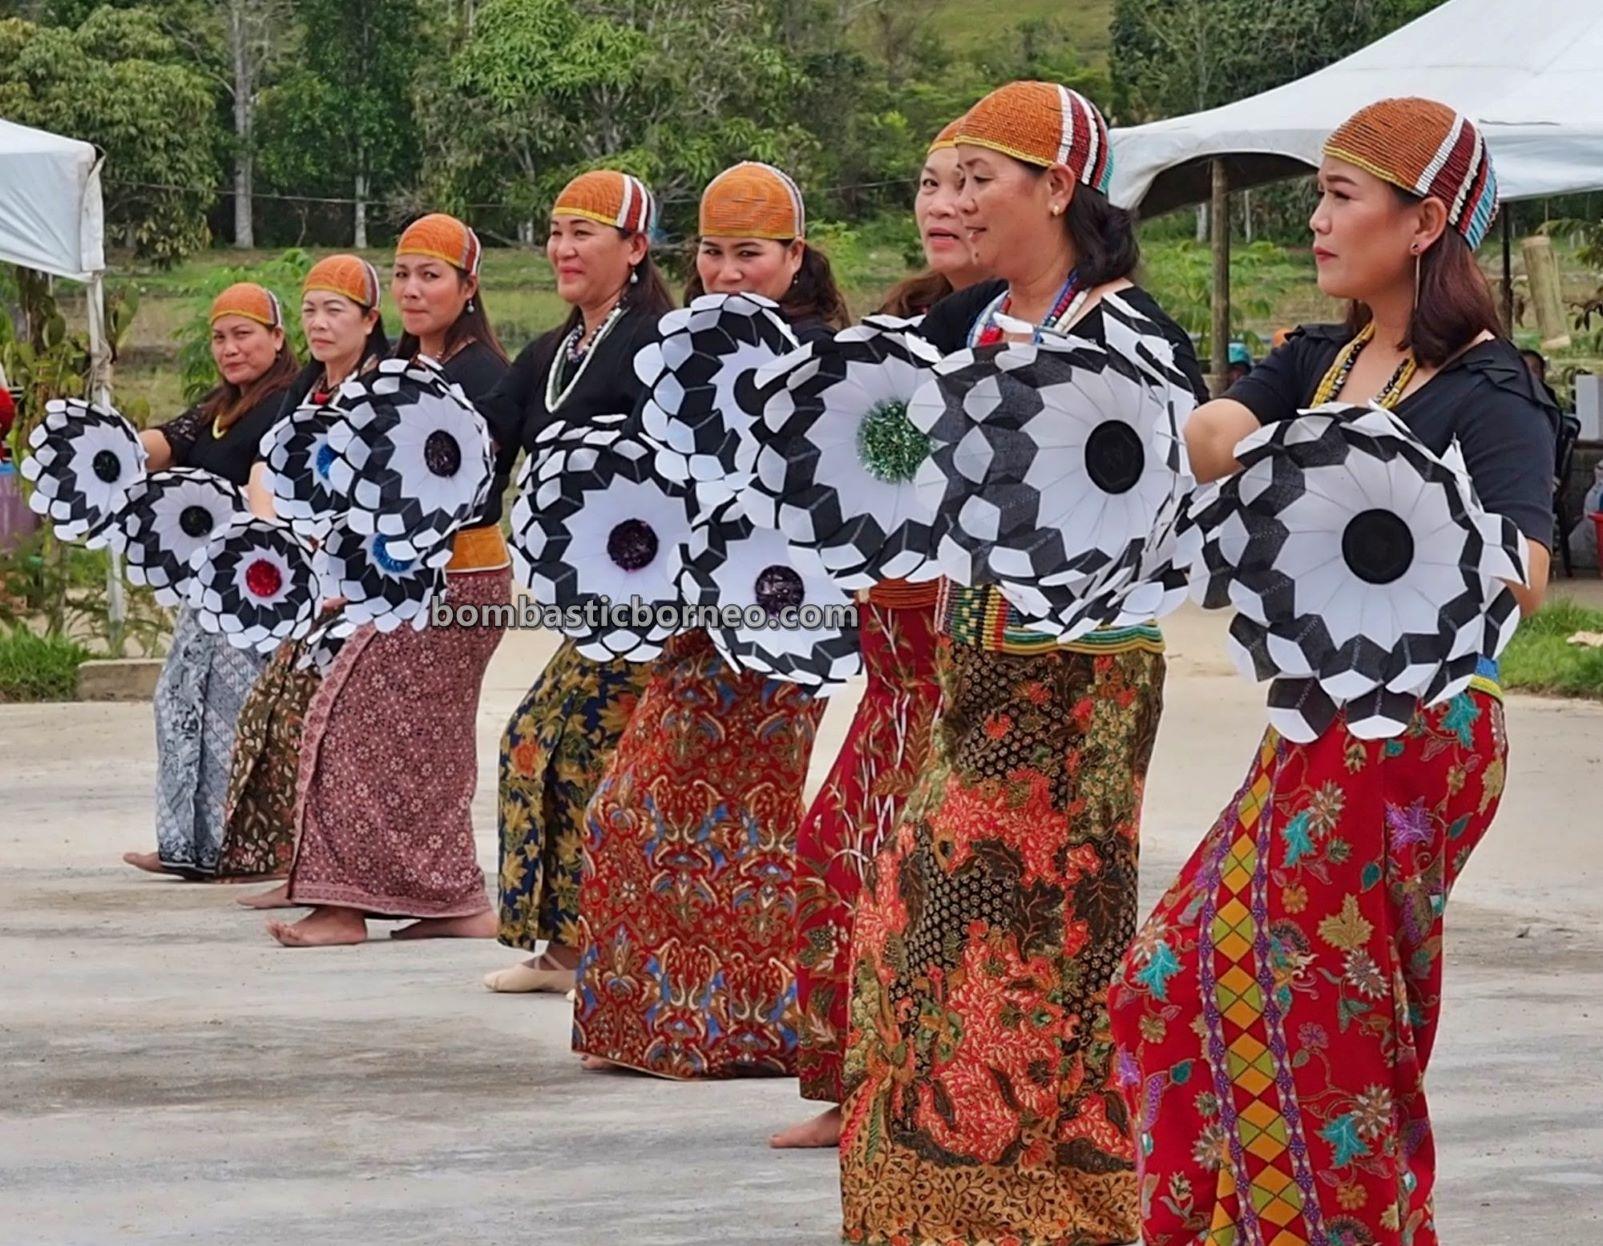 Pesta Nukenen, Bario Food Cultural Festival, traditional dance, authentic, indigenous, destination, native, Orang Ulu, tribal, Kelabit people, Malaysia, Sarawak, Tourism, travel guide, Trans Borneo,